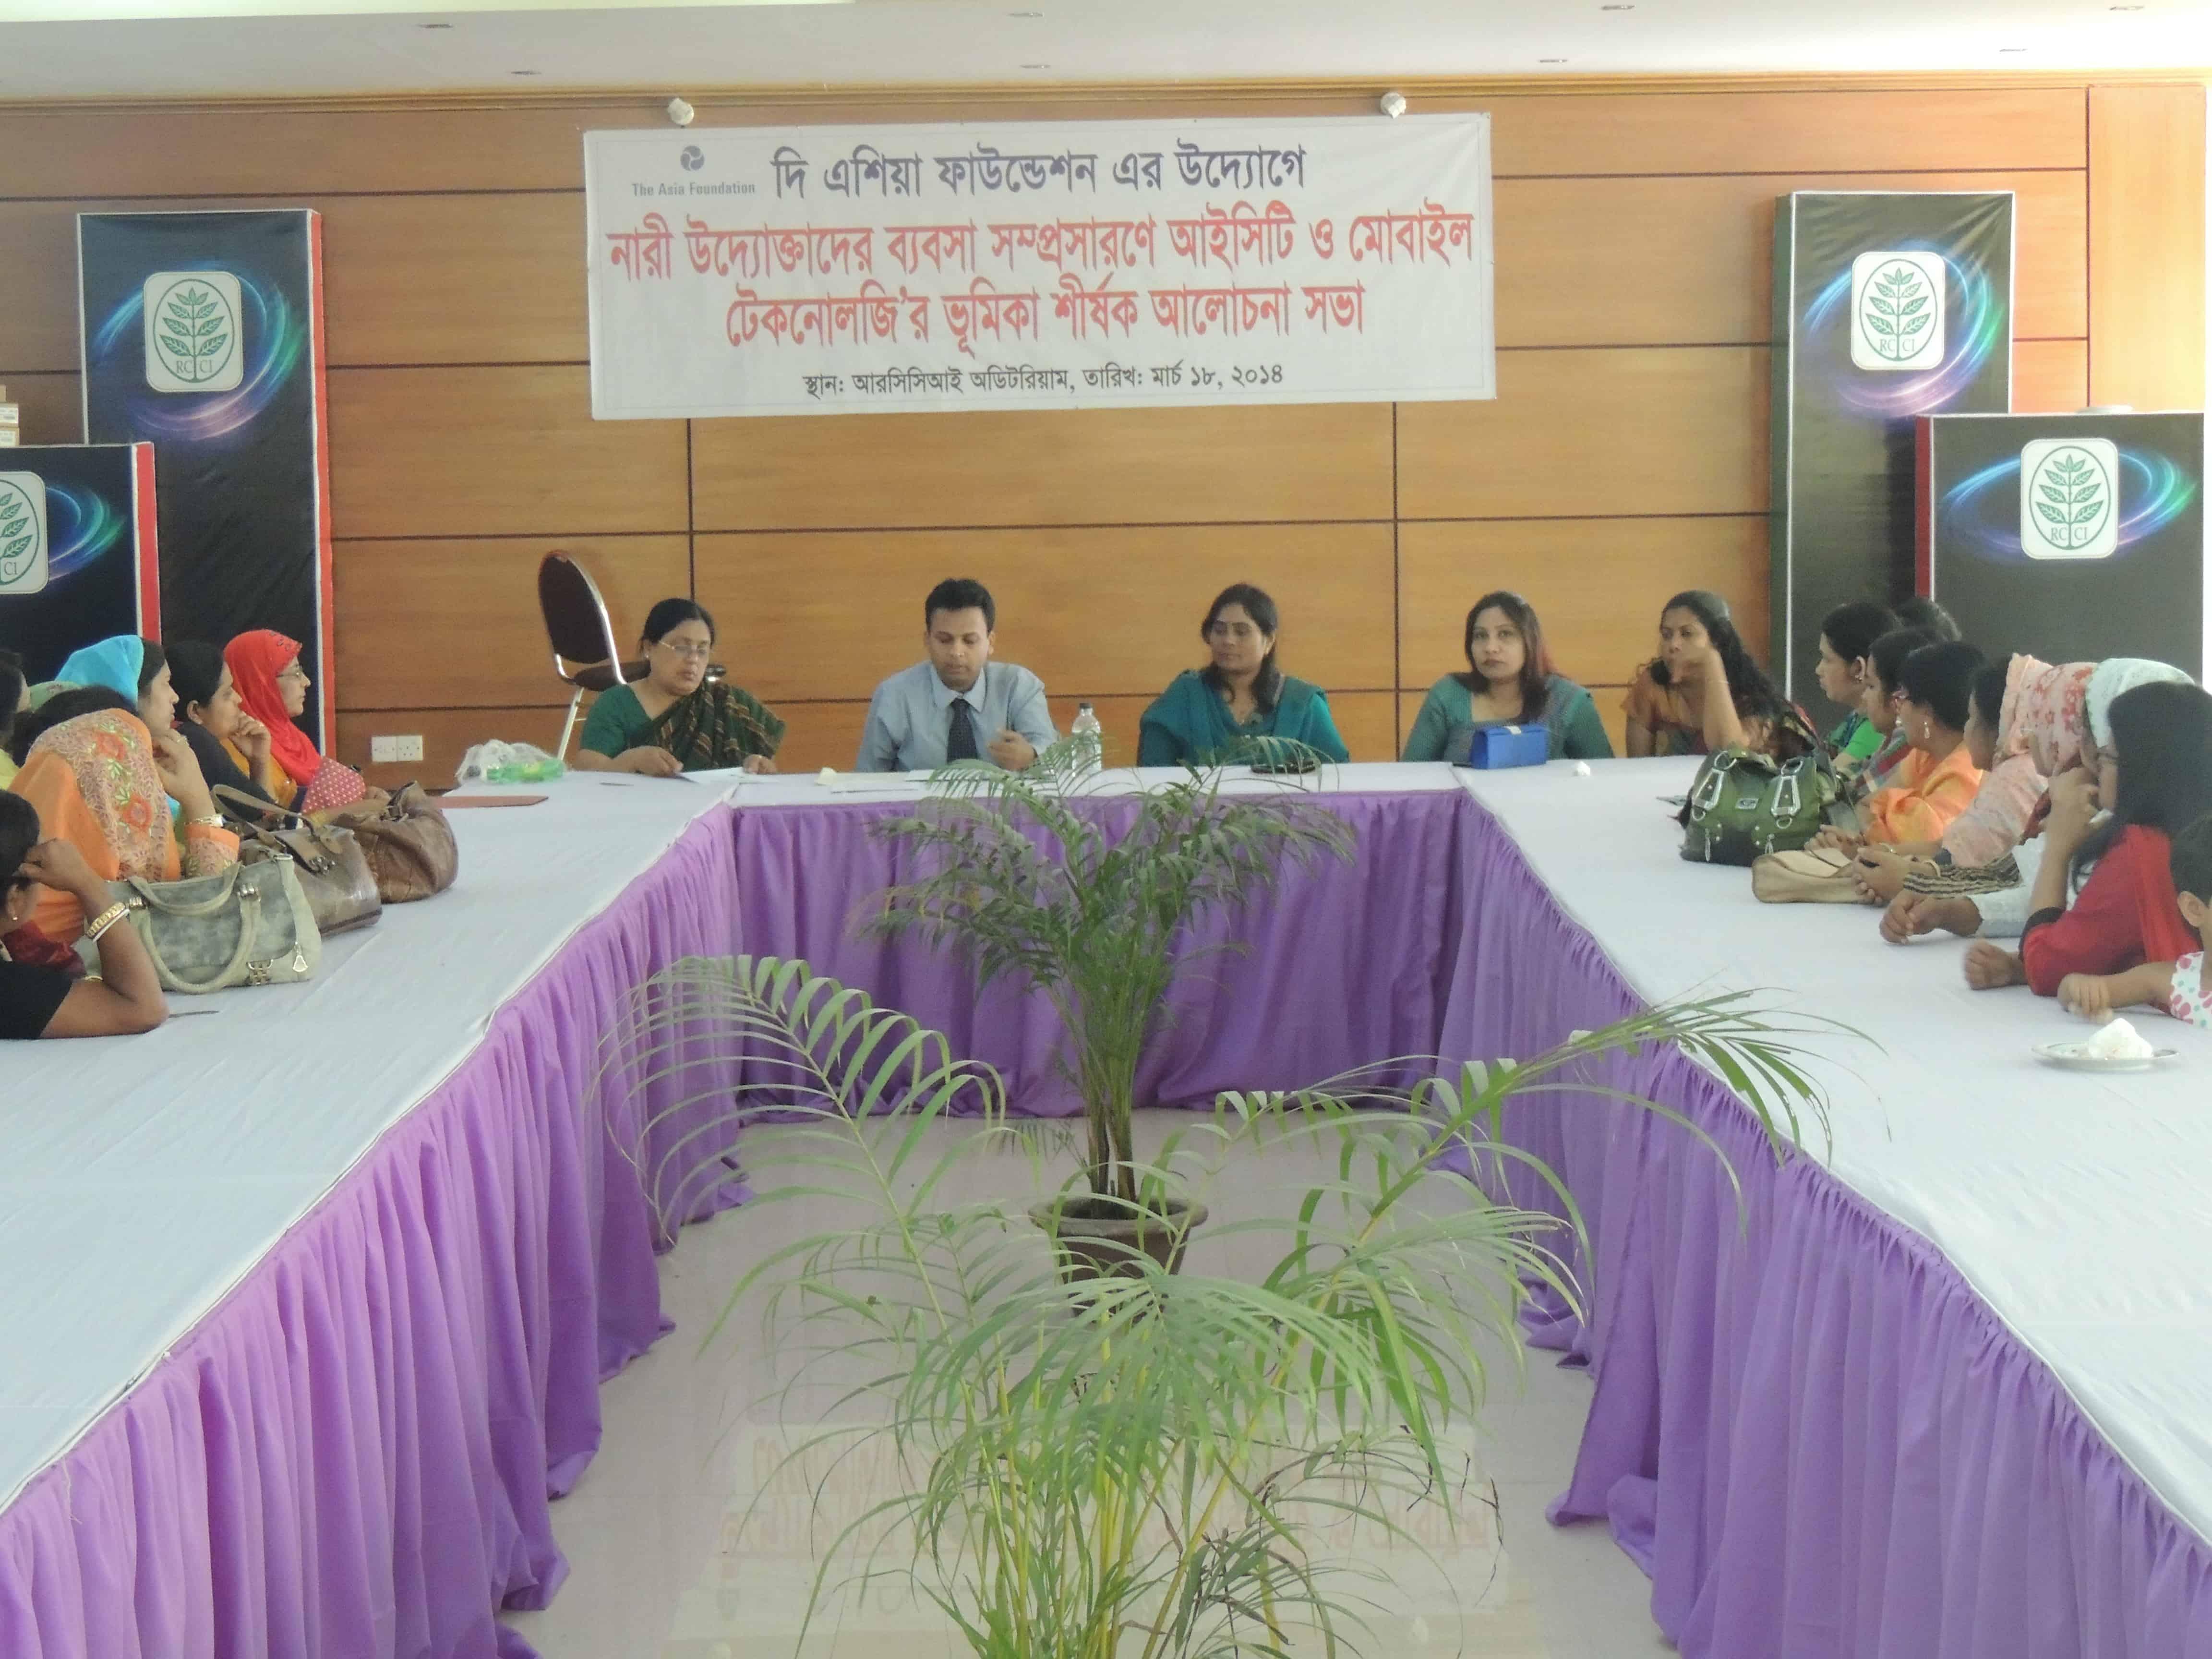 Archive-Bangladesh-TheAsiaFoundation-2